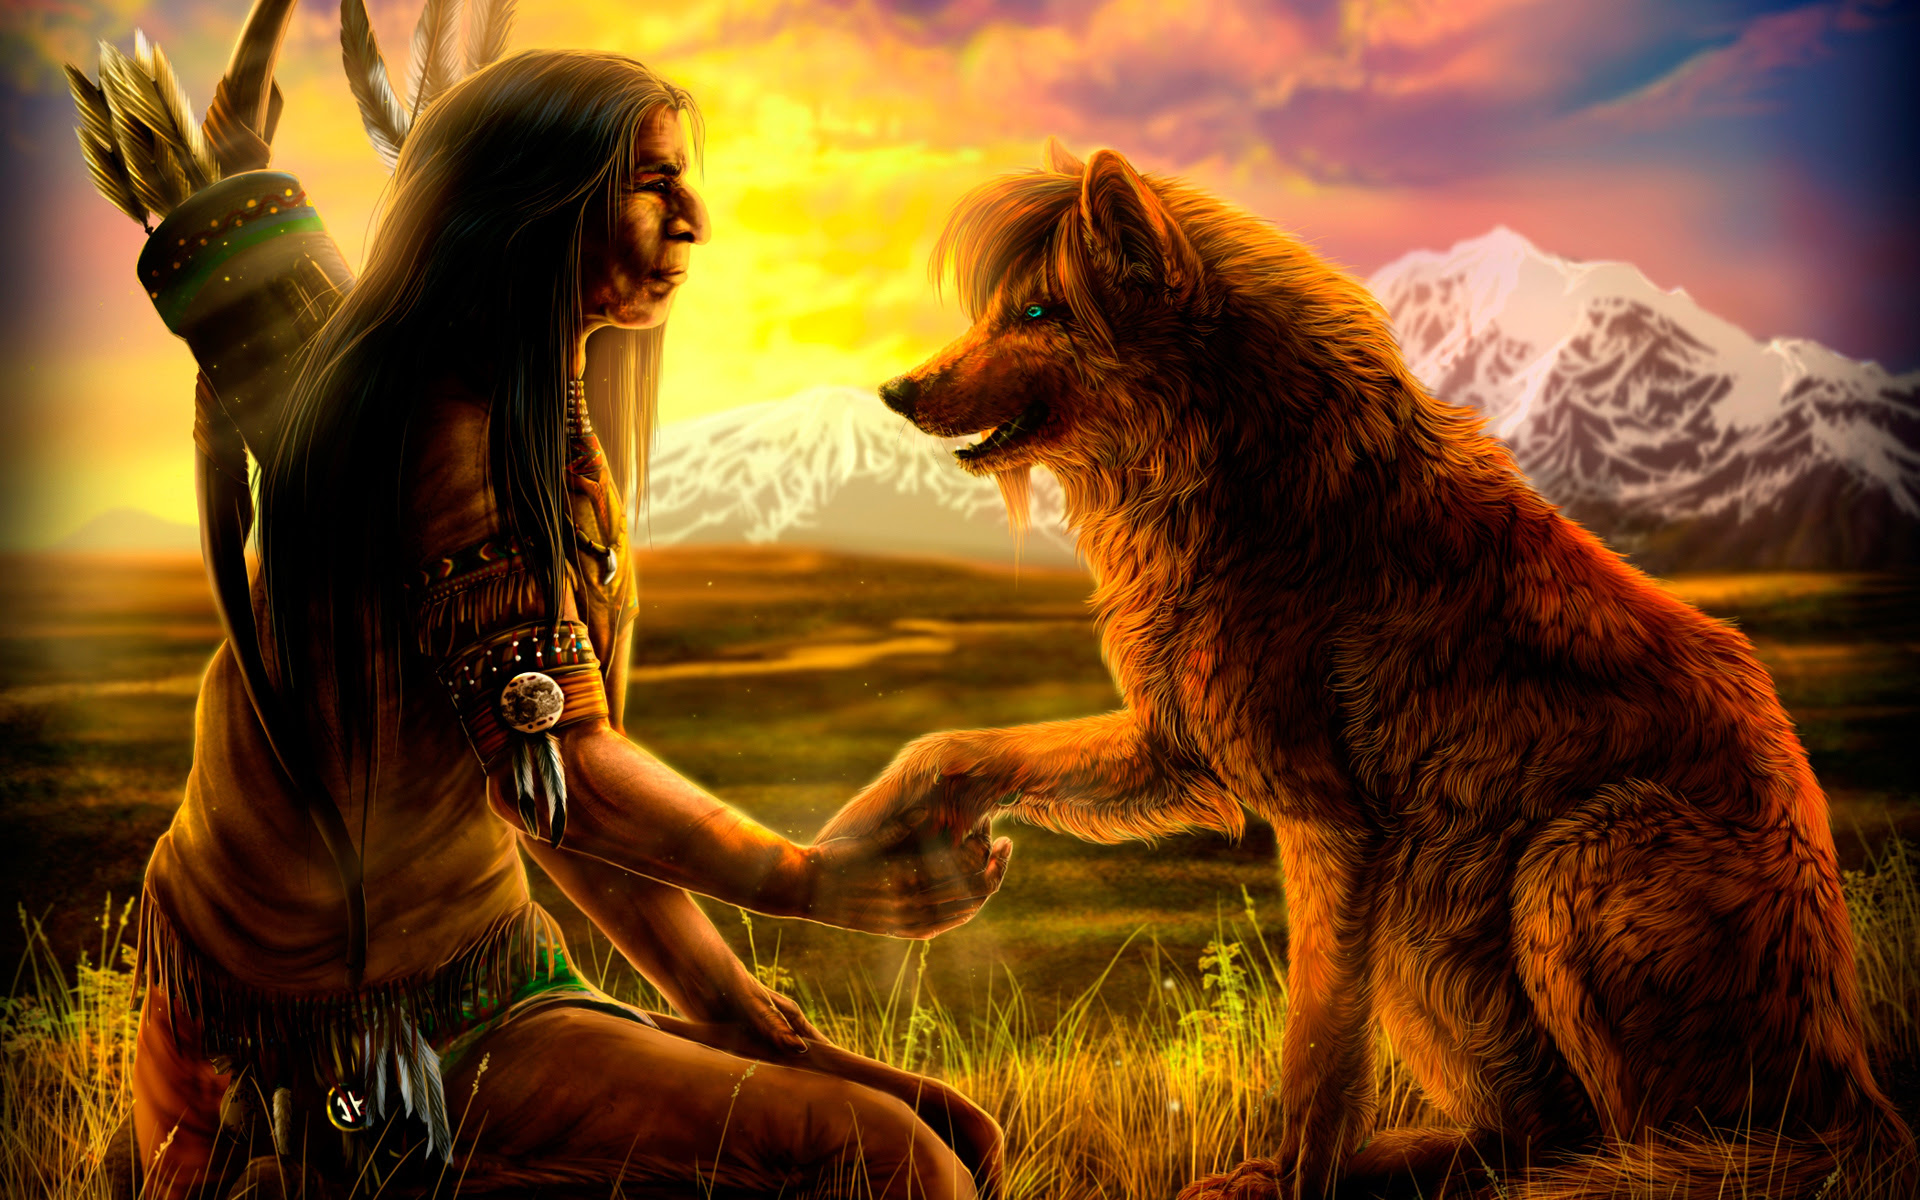 Native American Indians Wallpaper 34175373 Fanpop